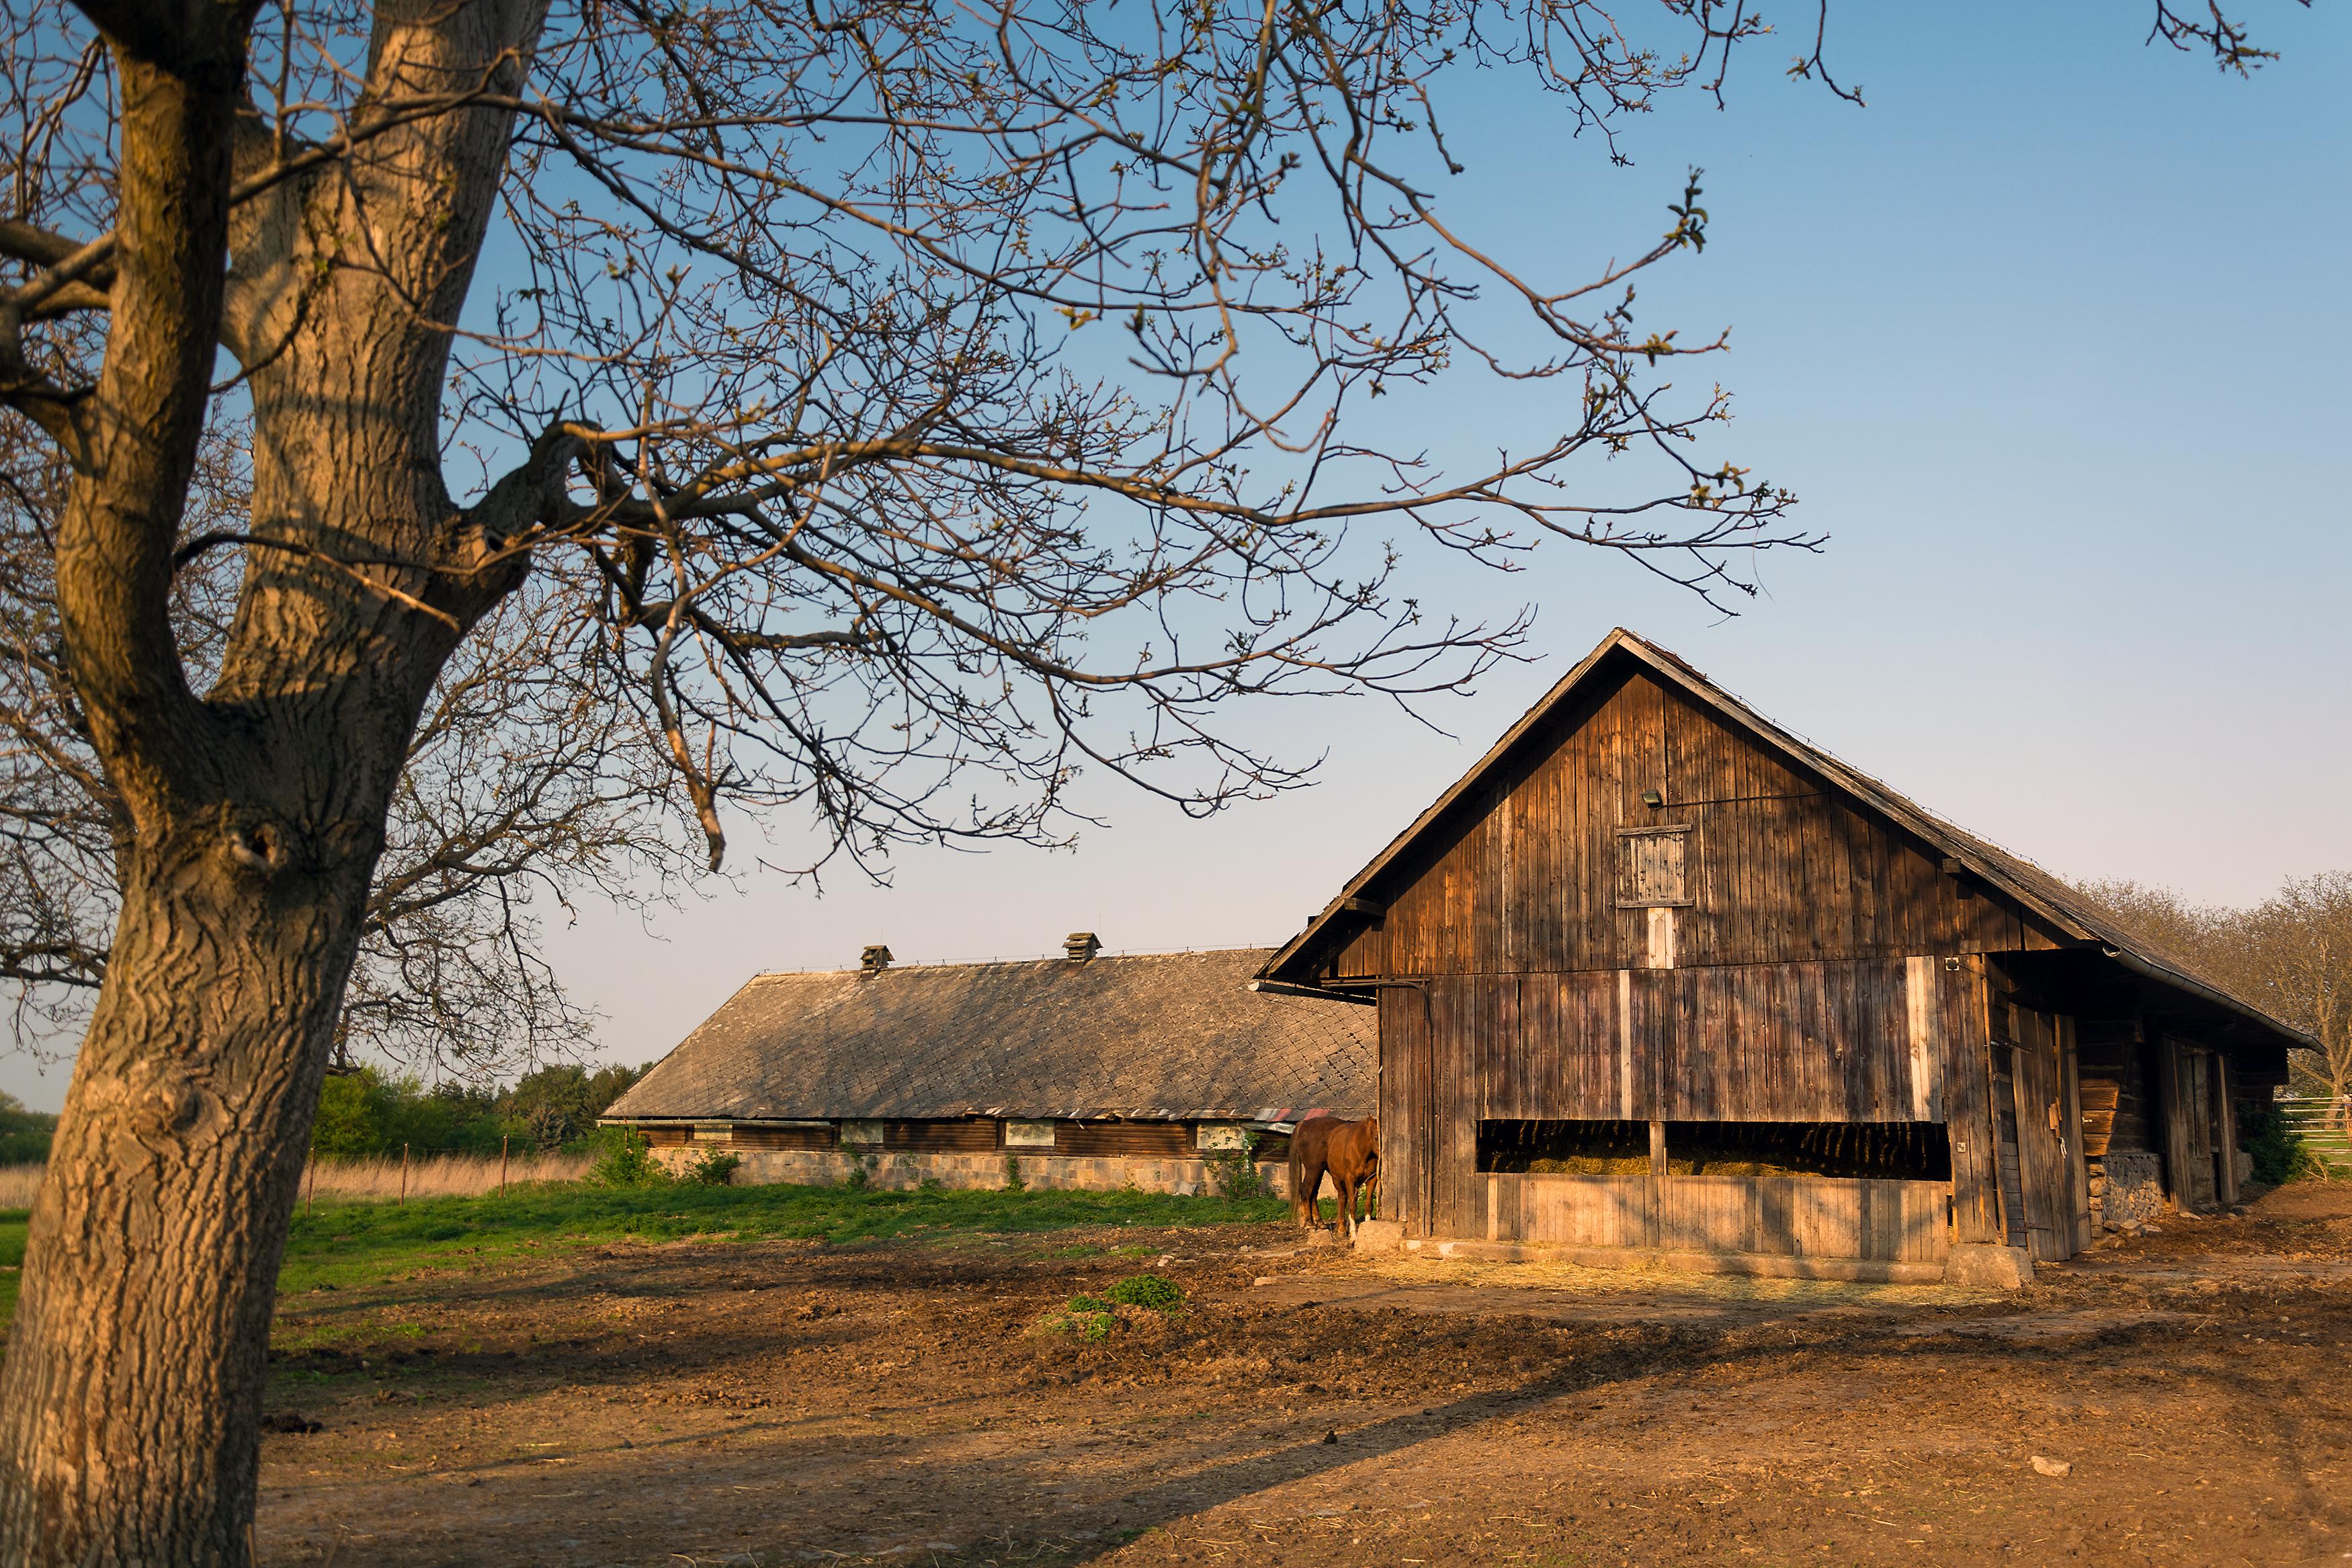 free image farm house libreshot public domain photos